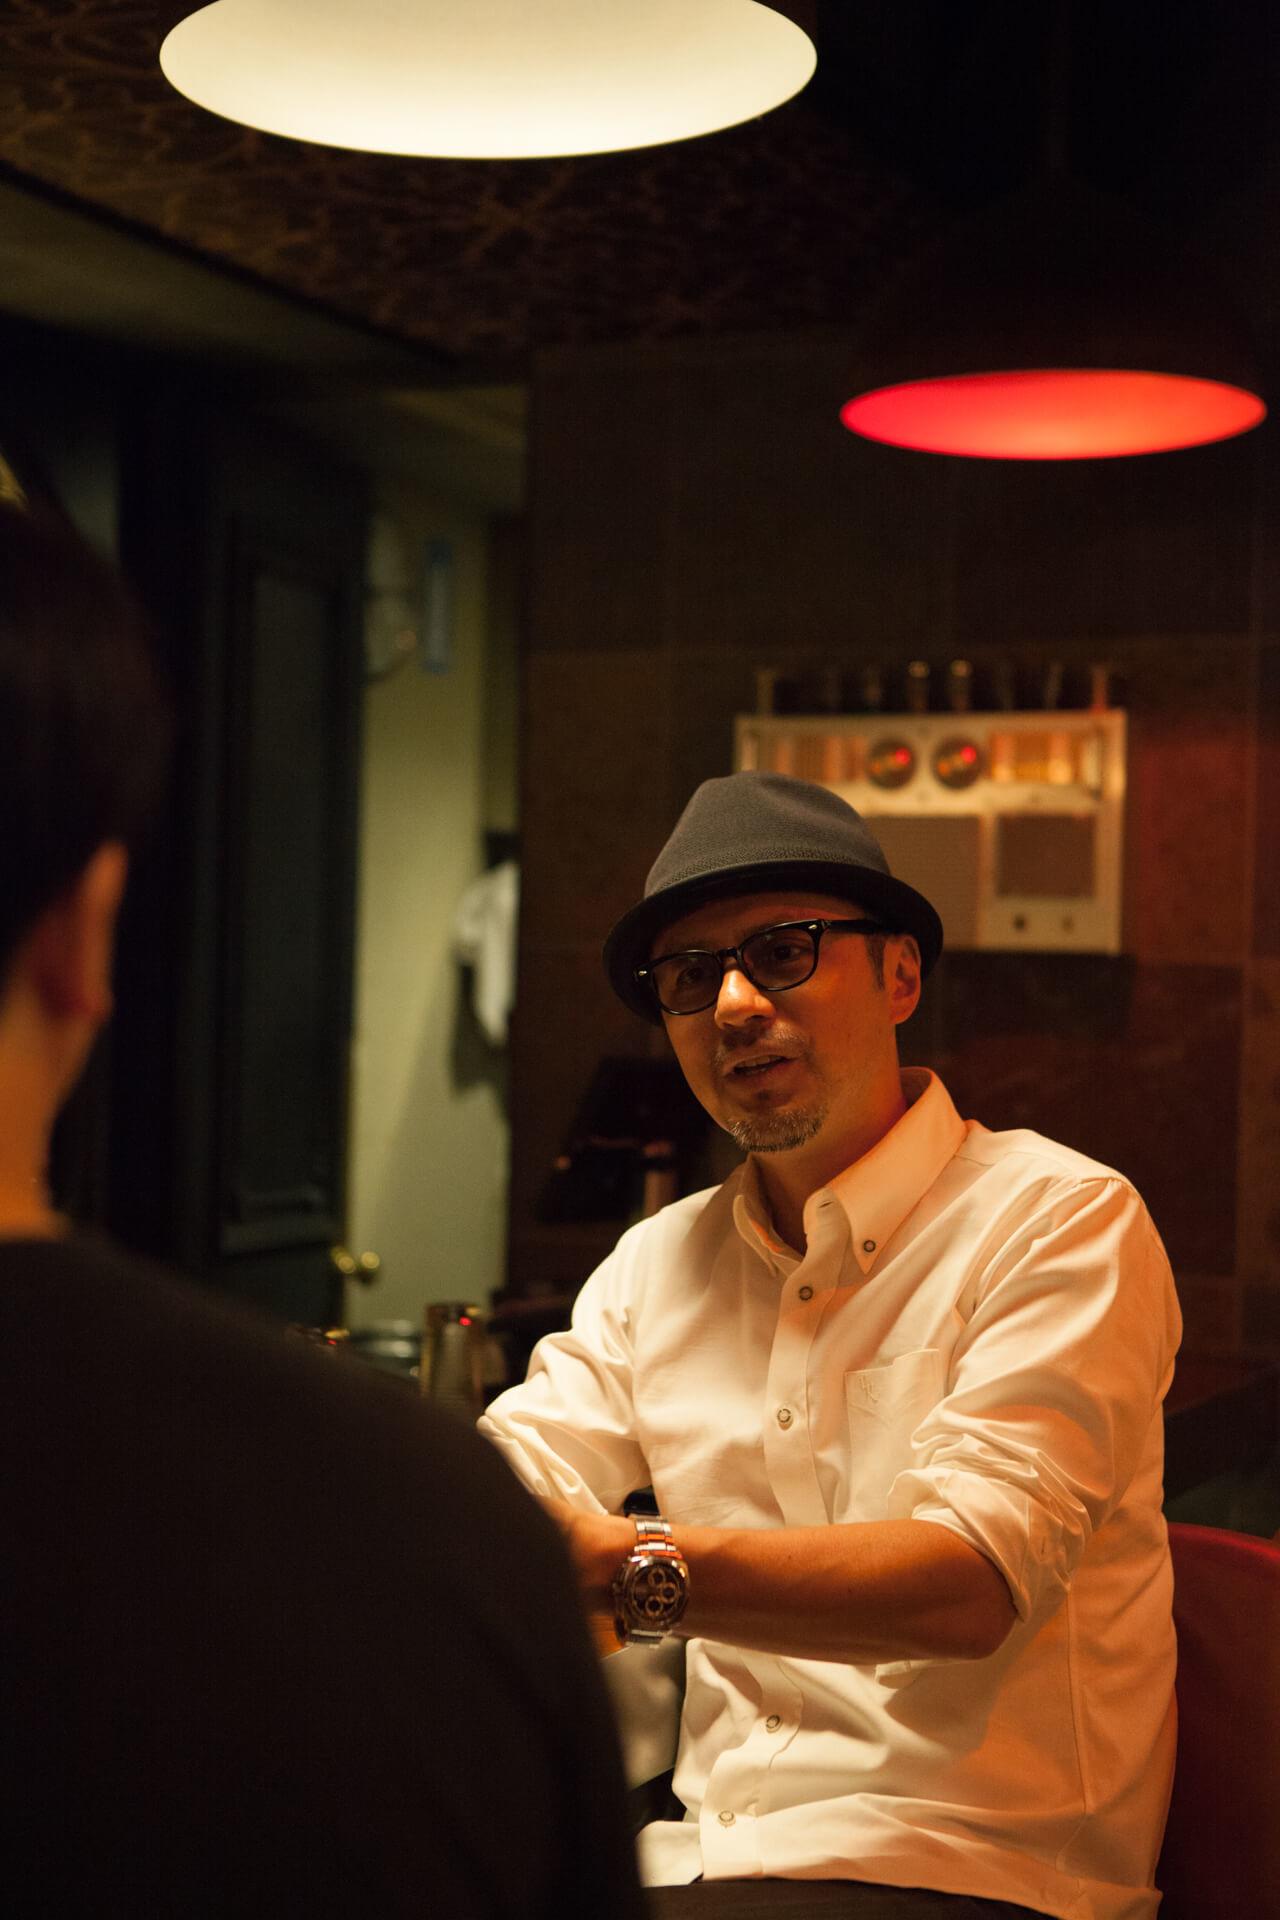 160321_beinspired-kameishi_02